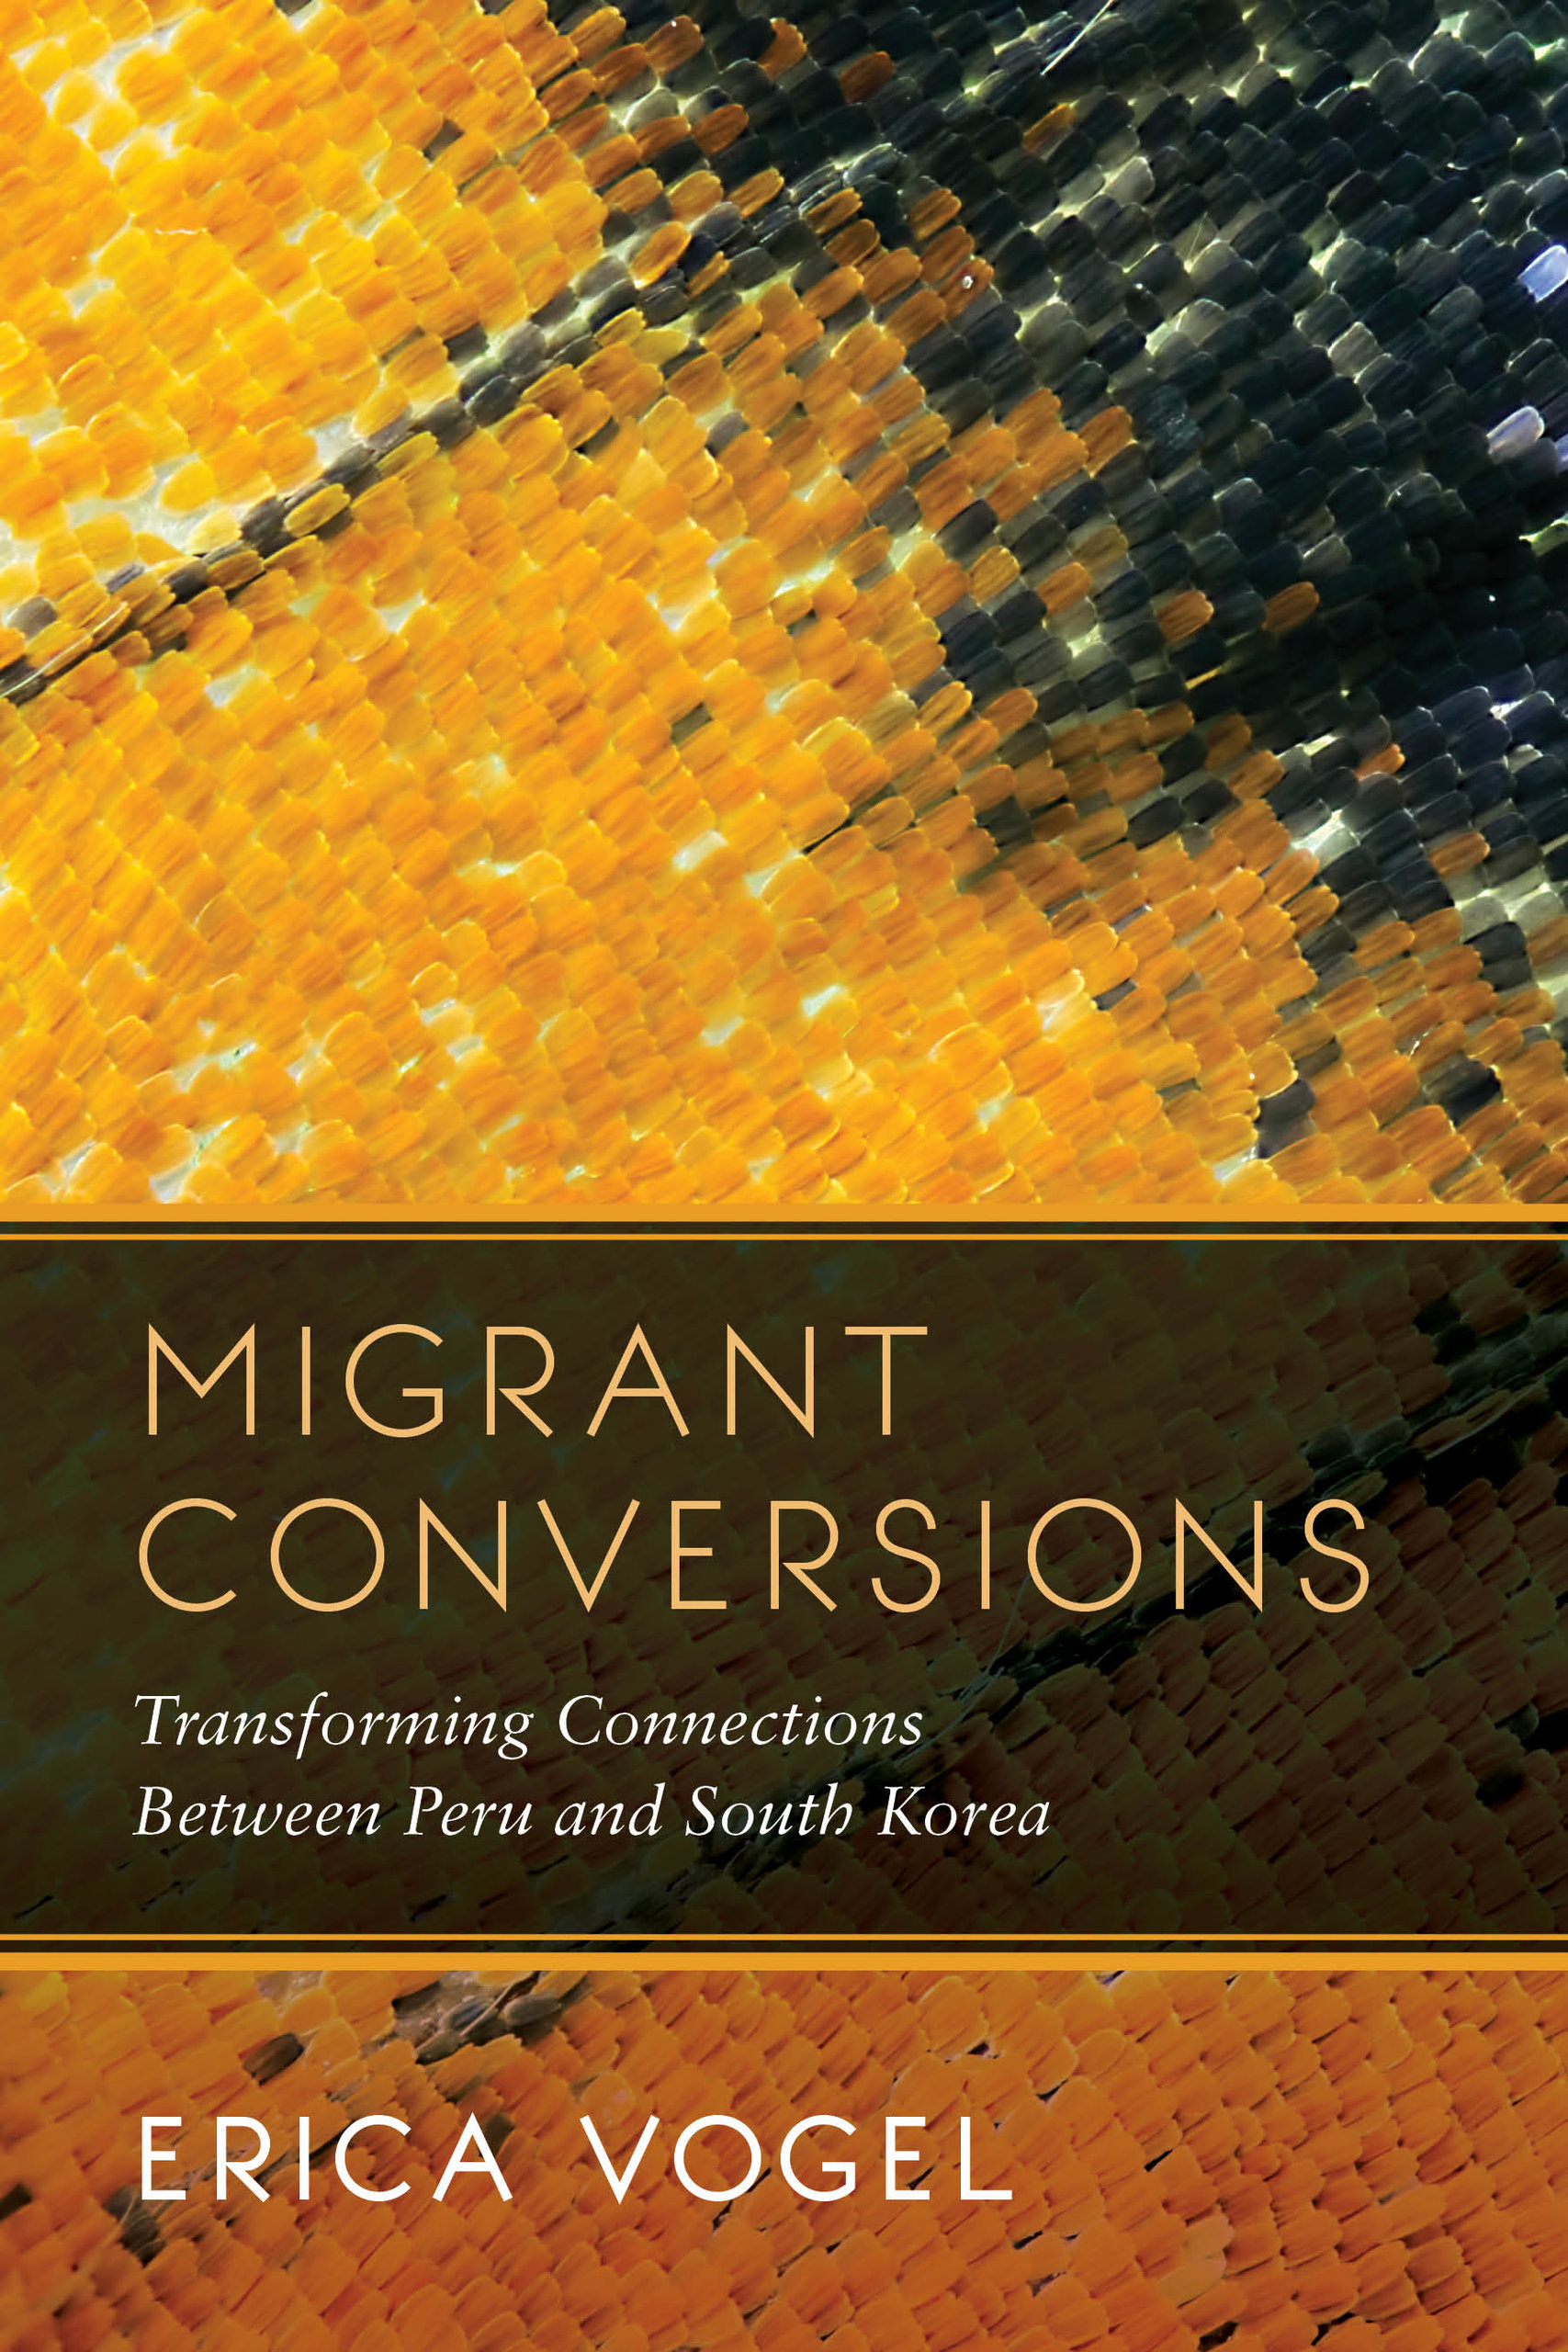 Migrant Conversions book cover